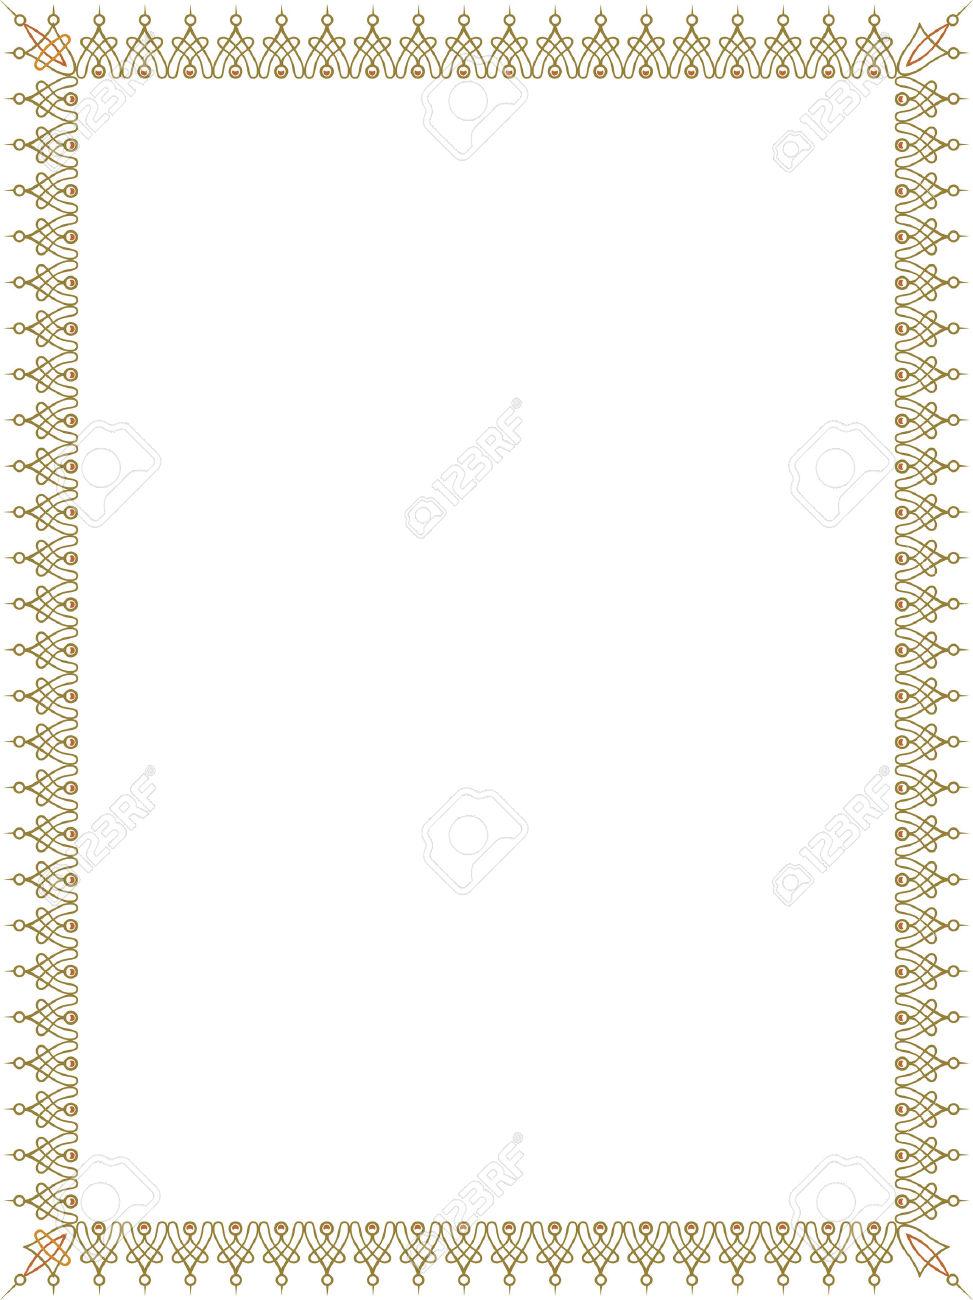 simple color border clipart